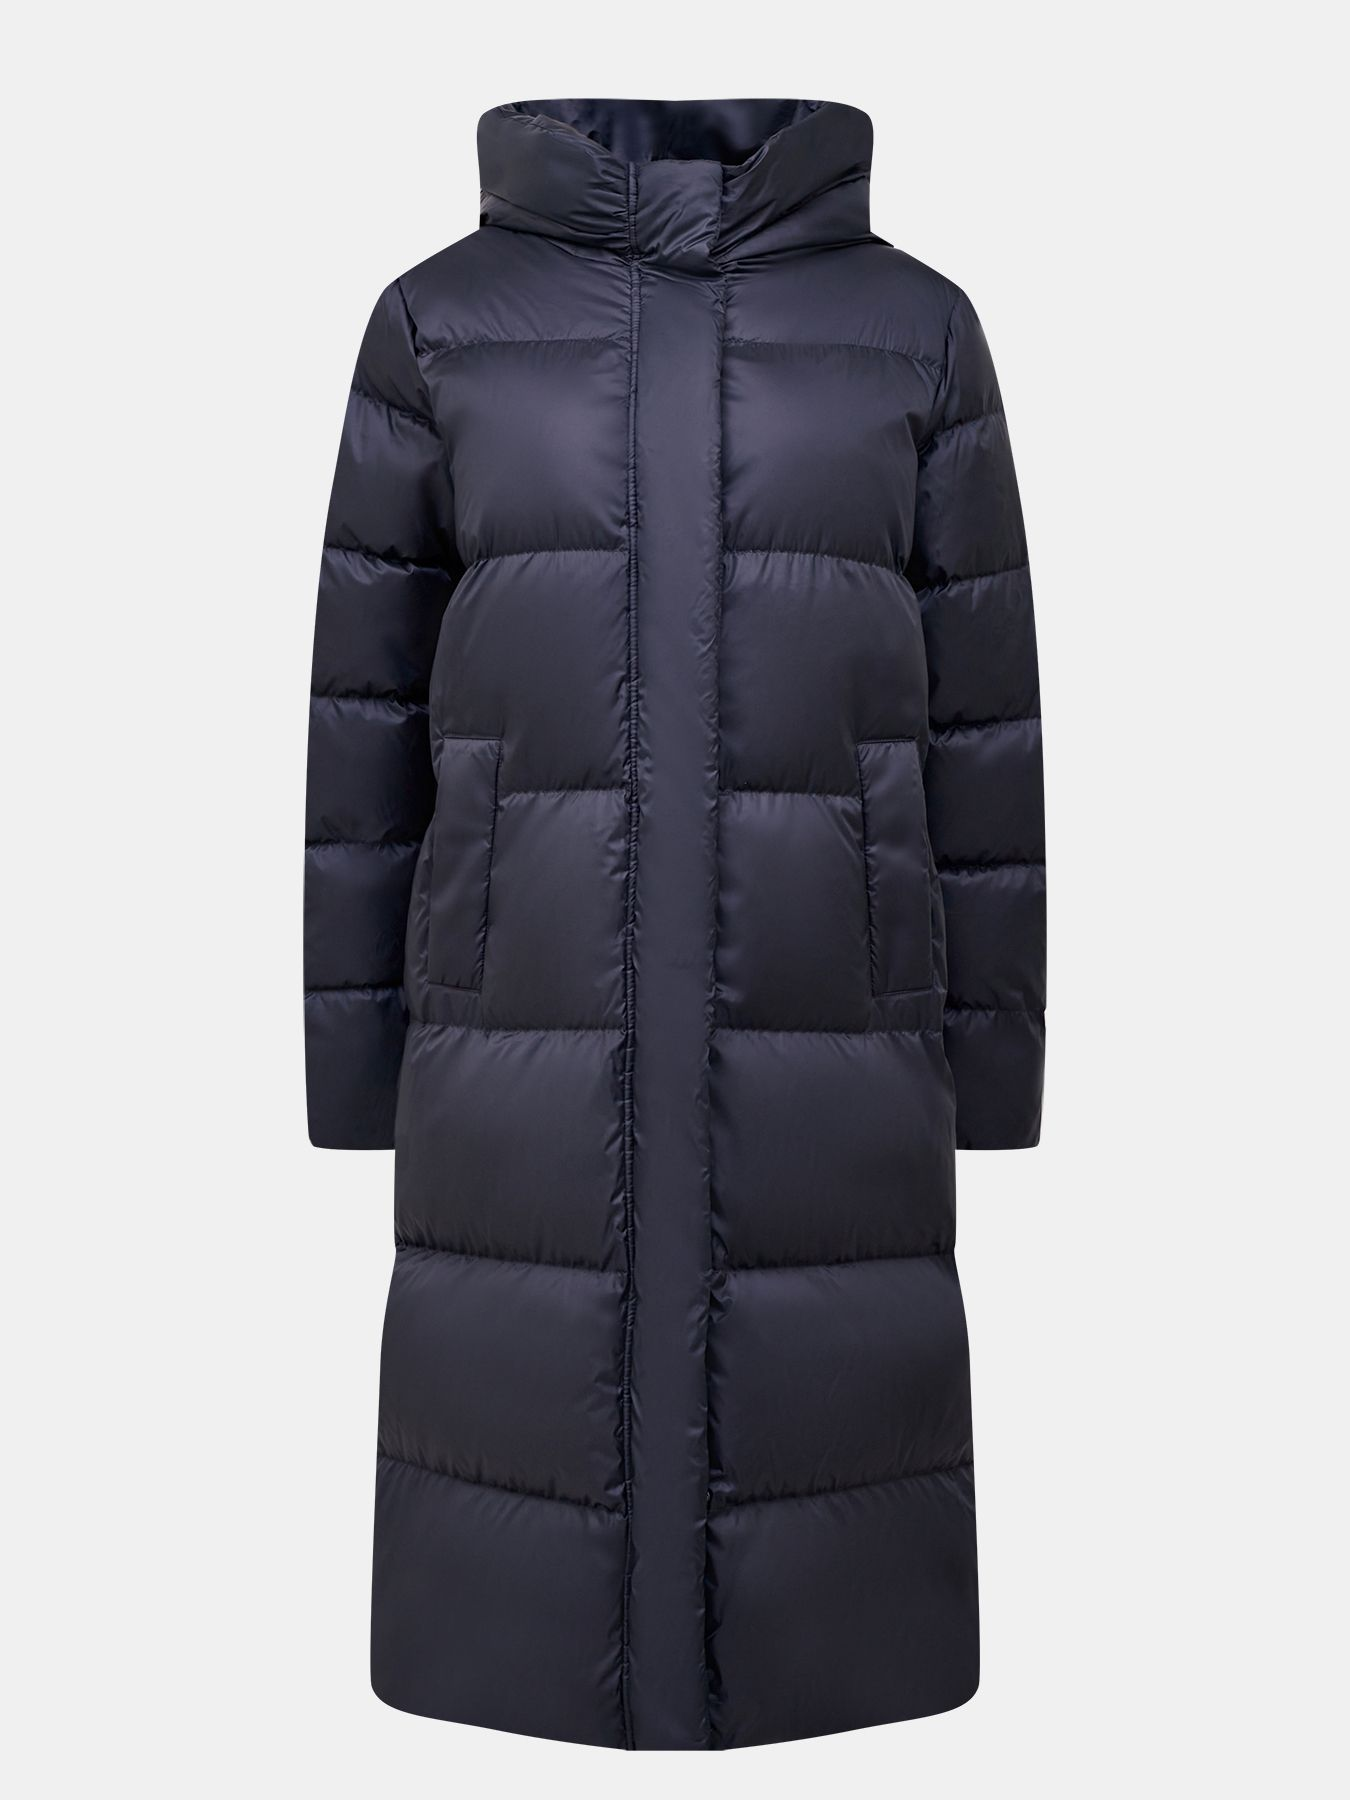 Фото - Пуховики Gerry Weber Edition Куртка куртка утепленная jorg weber jorg weber mp002xm0yi6y